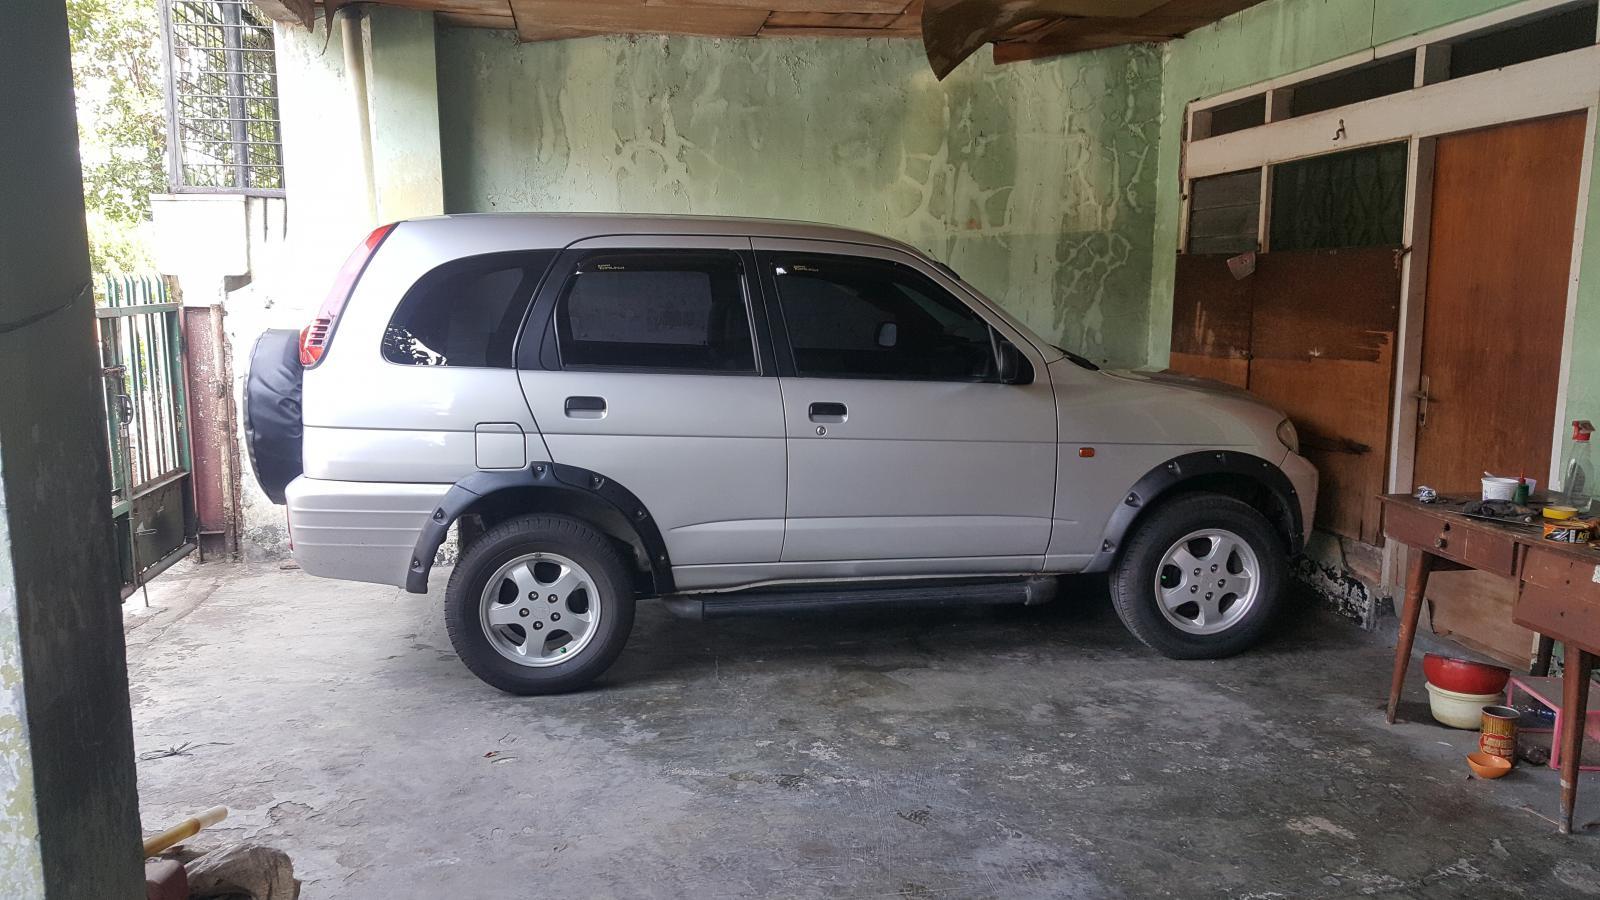 2000 Daihatsu Terios / Taruna I J100, generation #1 1.6 ...